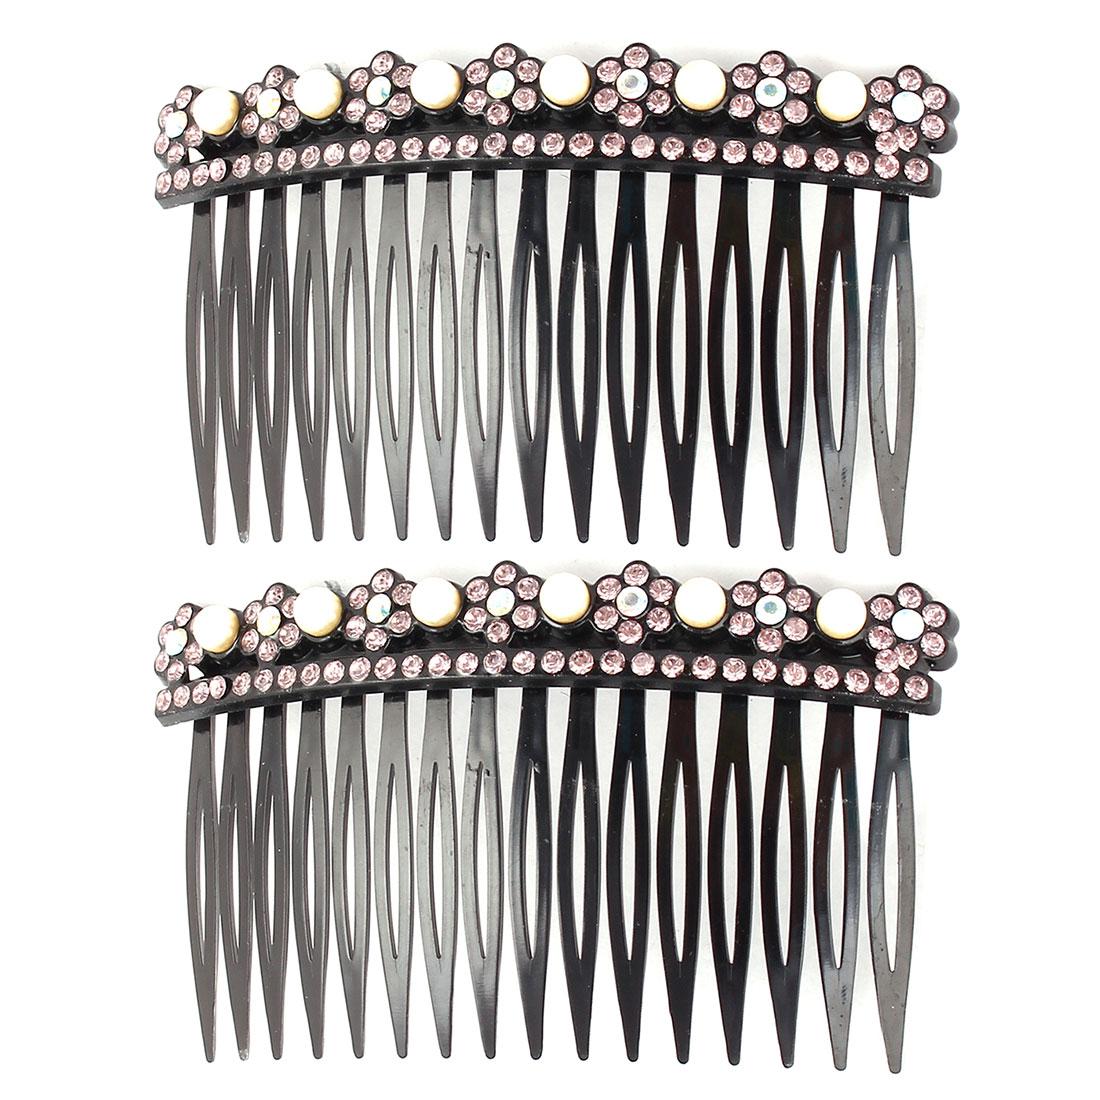 Lady Plastic Flower Design Decor Inlaid 16 Teeth Comb Hair Clips Pale Pink 2pcs